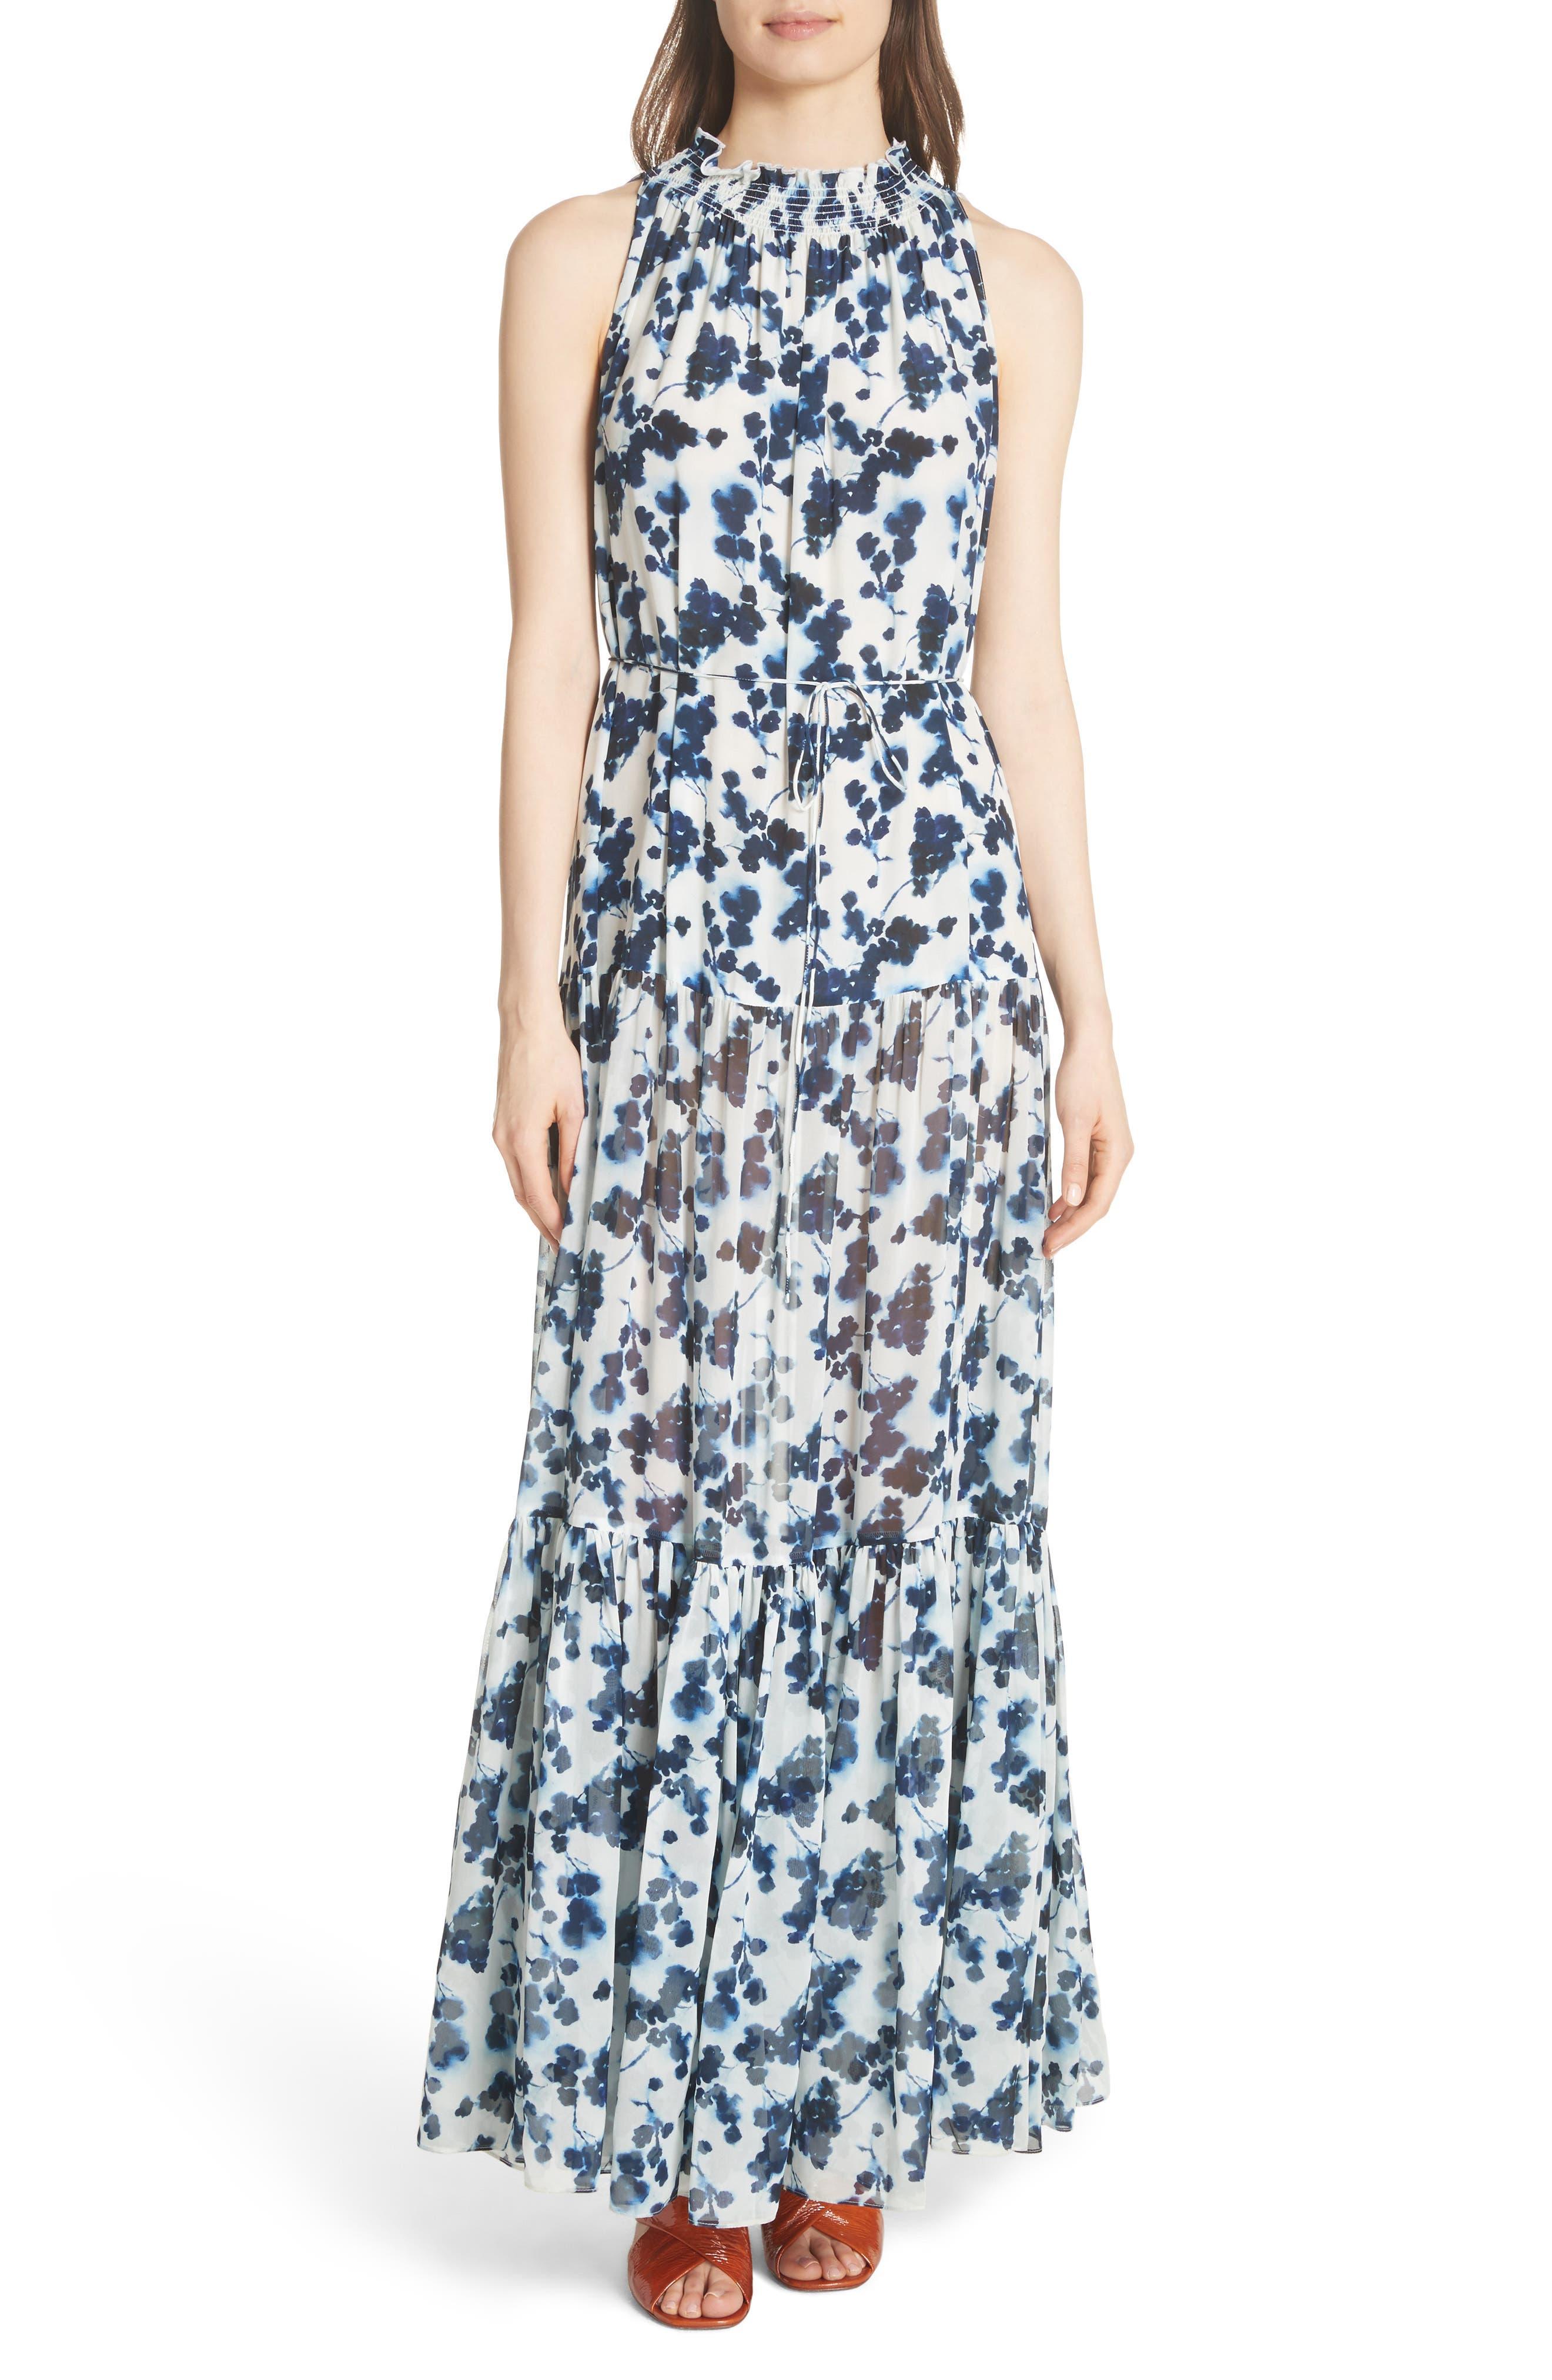 Lani P Floral Print Silk Dress,                         Main,                         color, Navy/ White